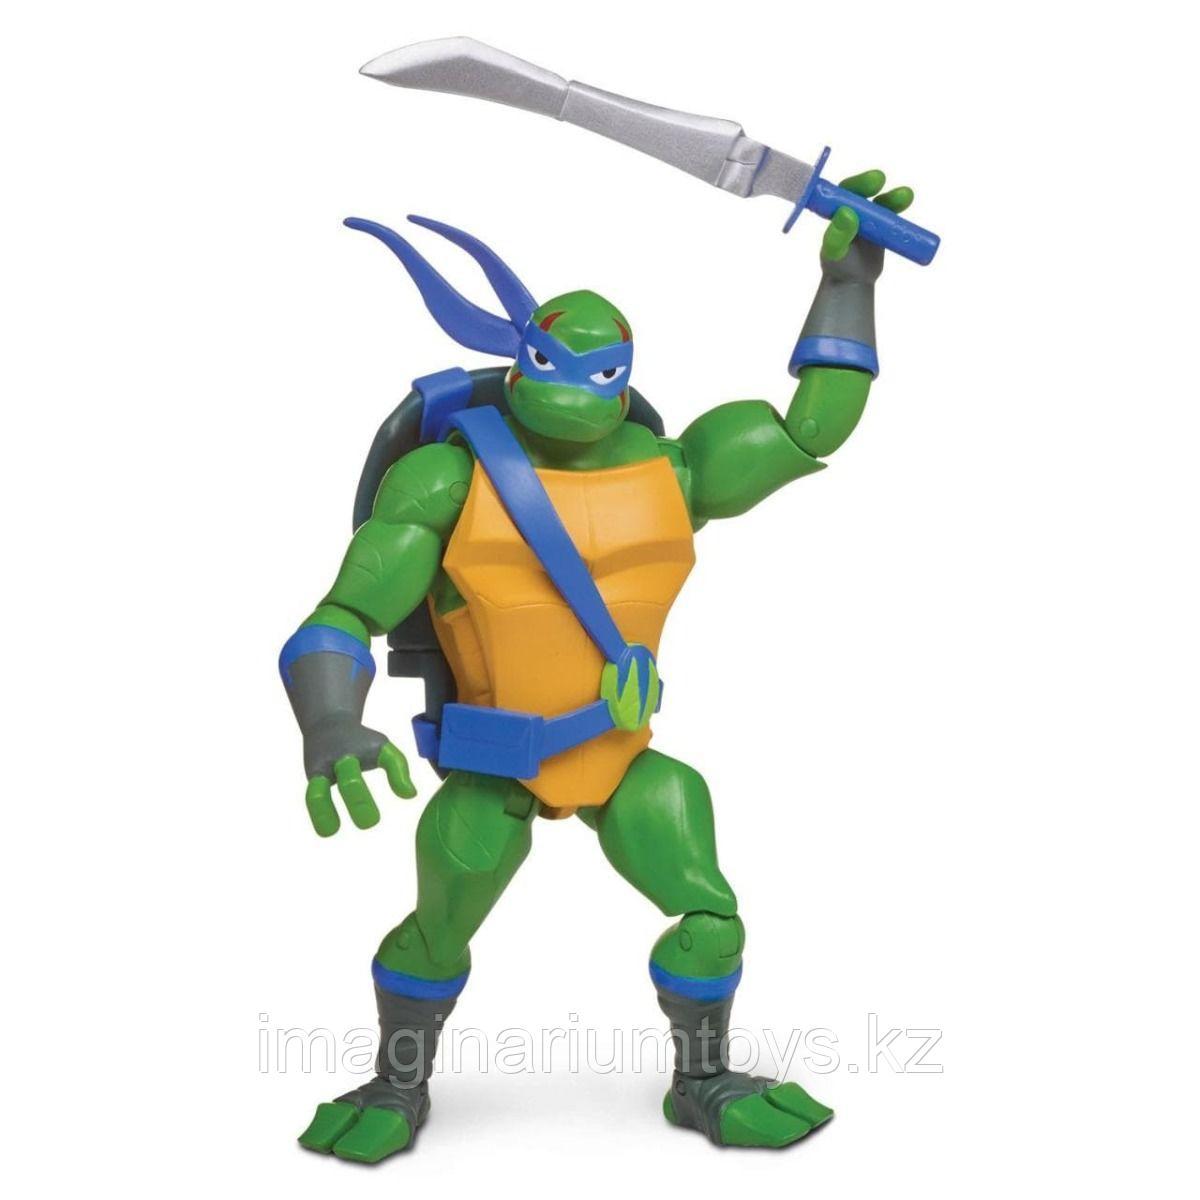 Игрушка Черепашки-ниндзя Фигурка Леонардо с боевым панцирем 12 см